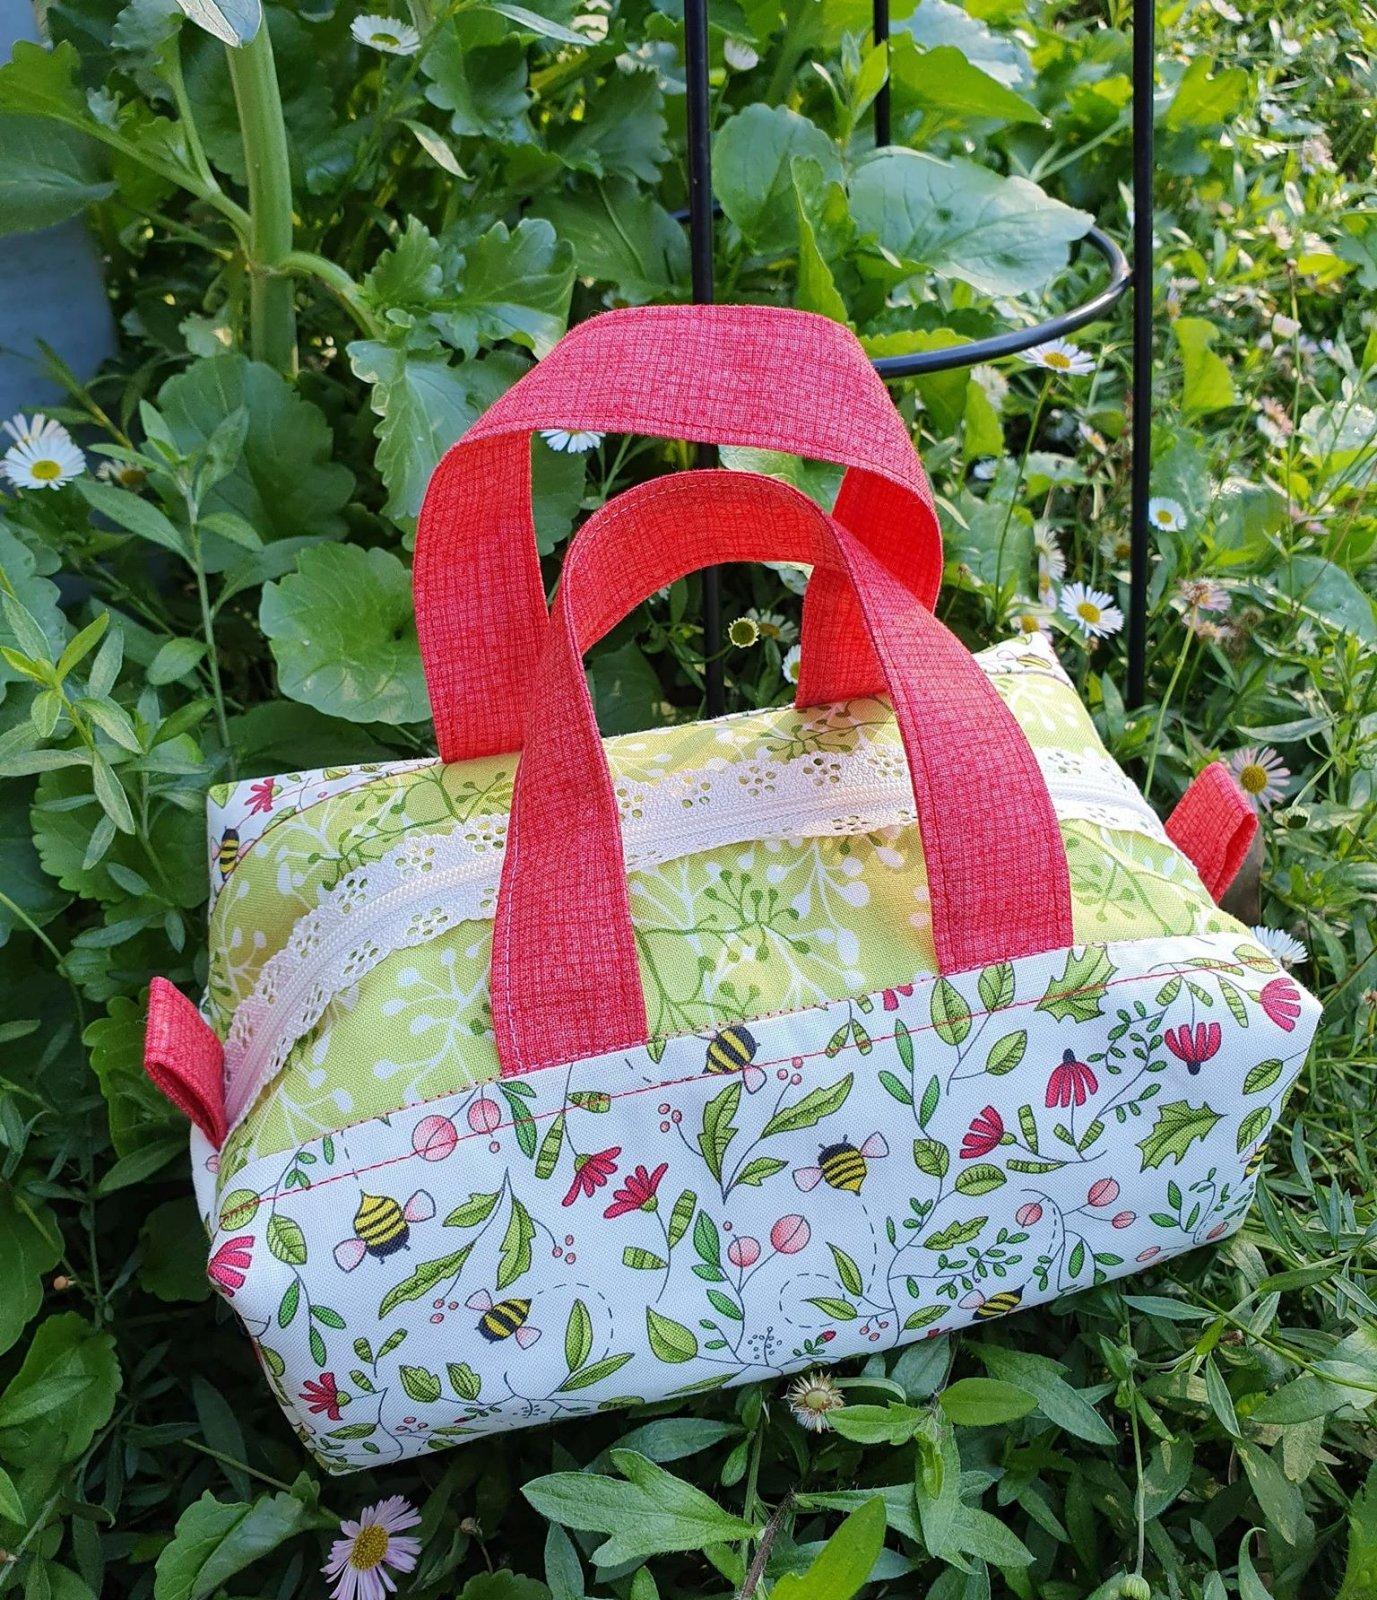 Stitch in Spring Bag